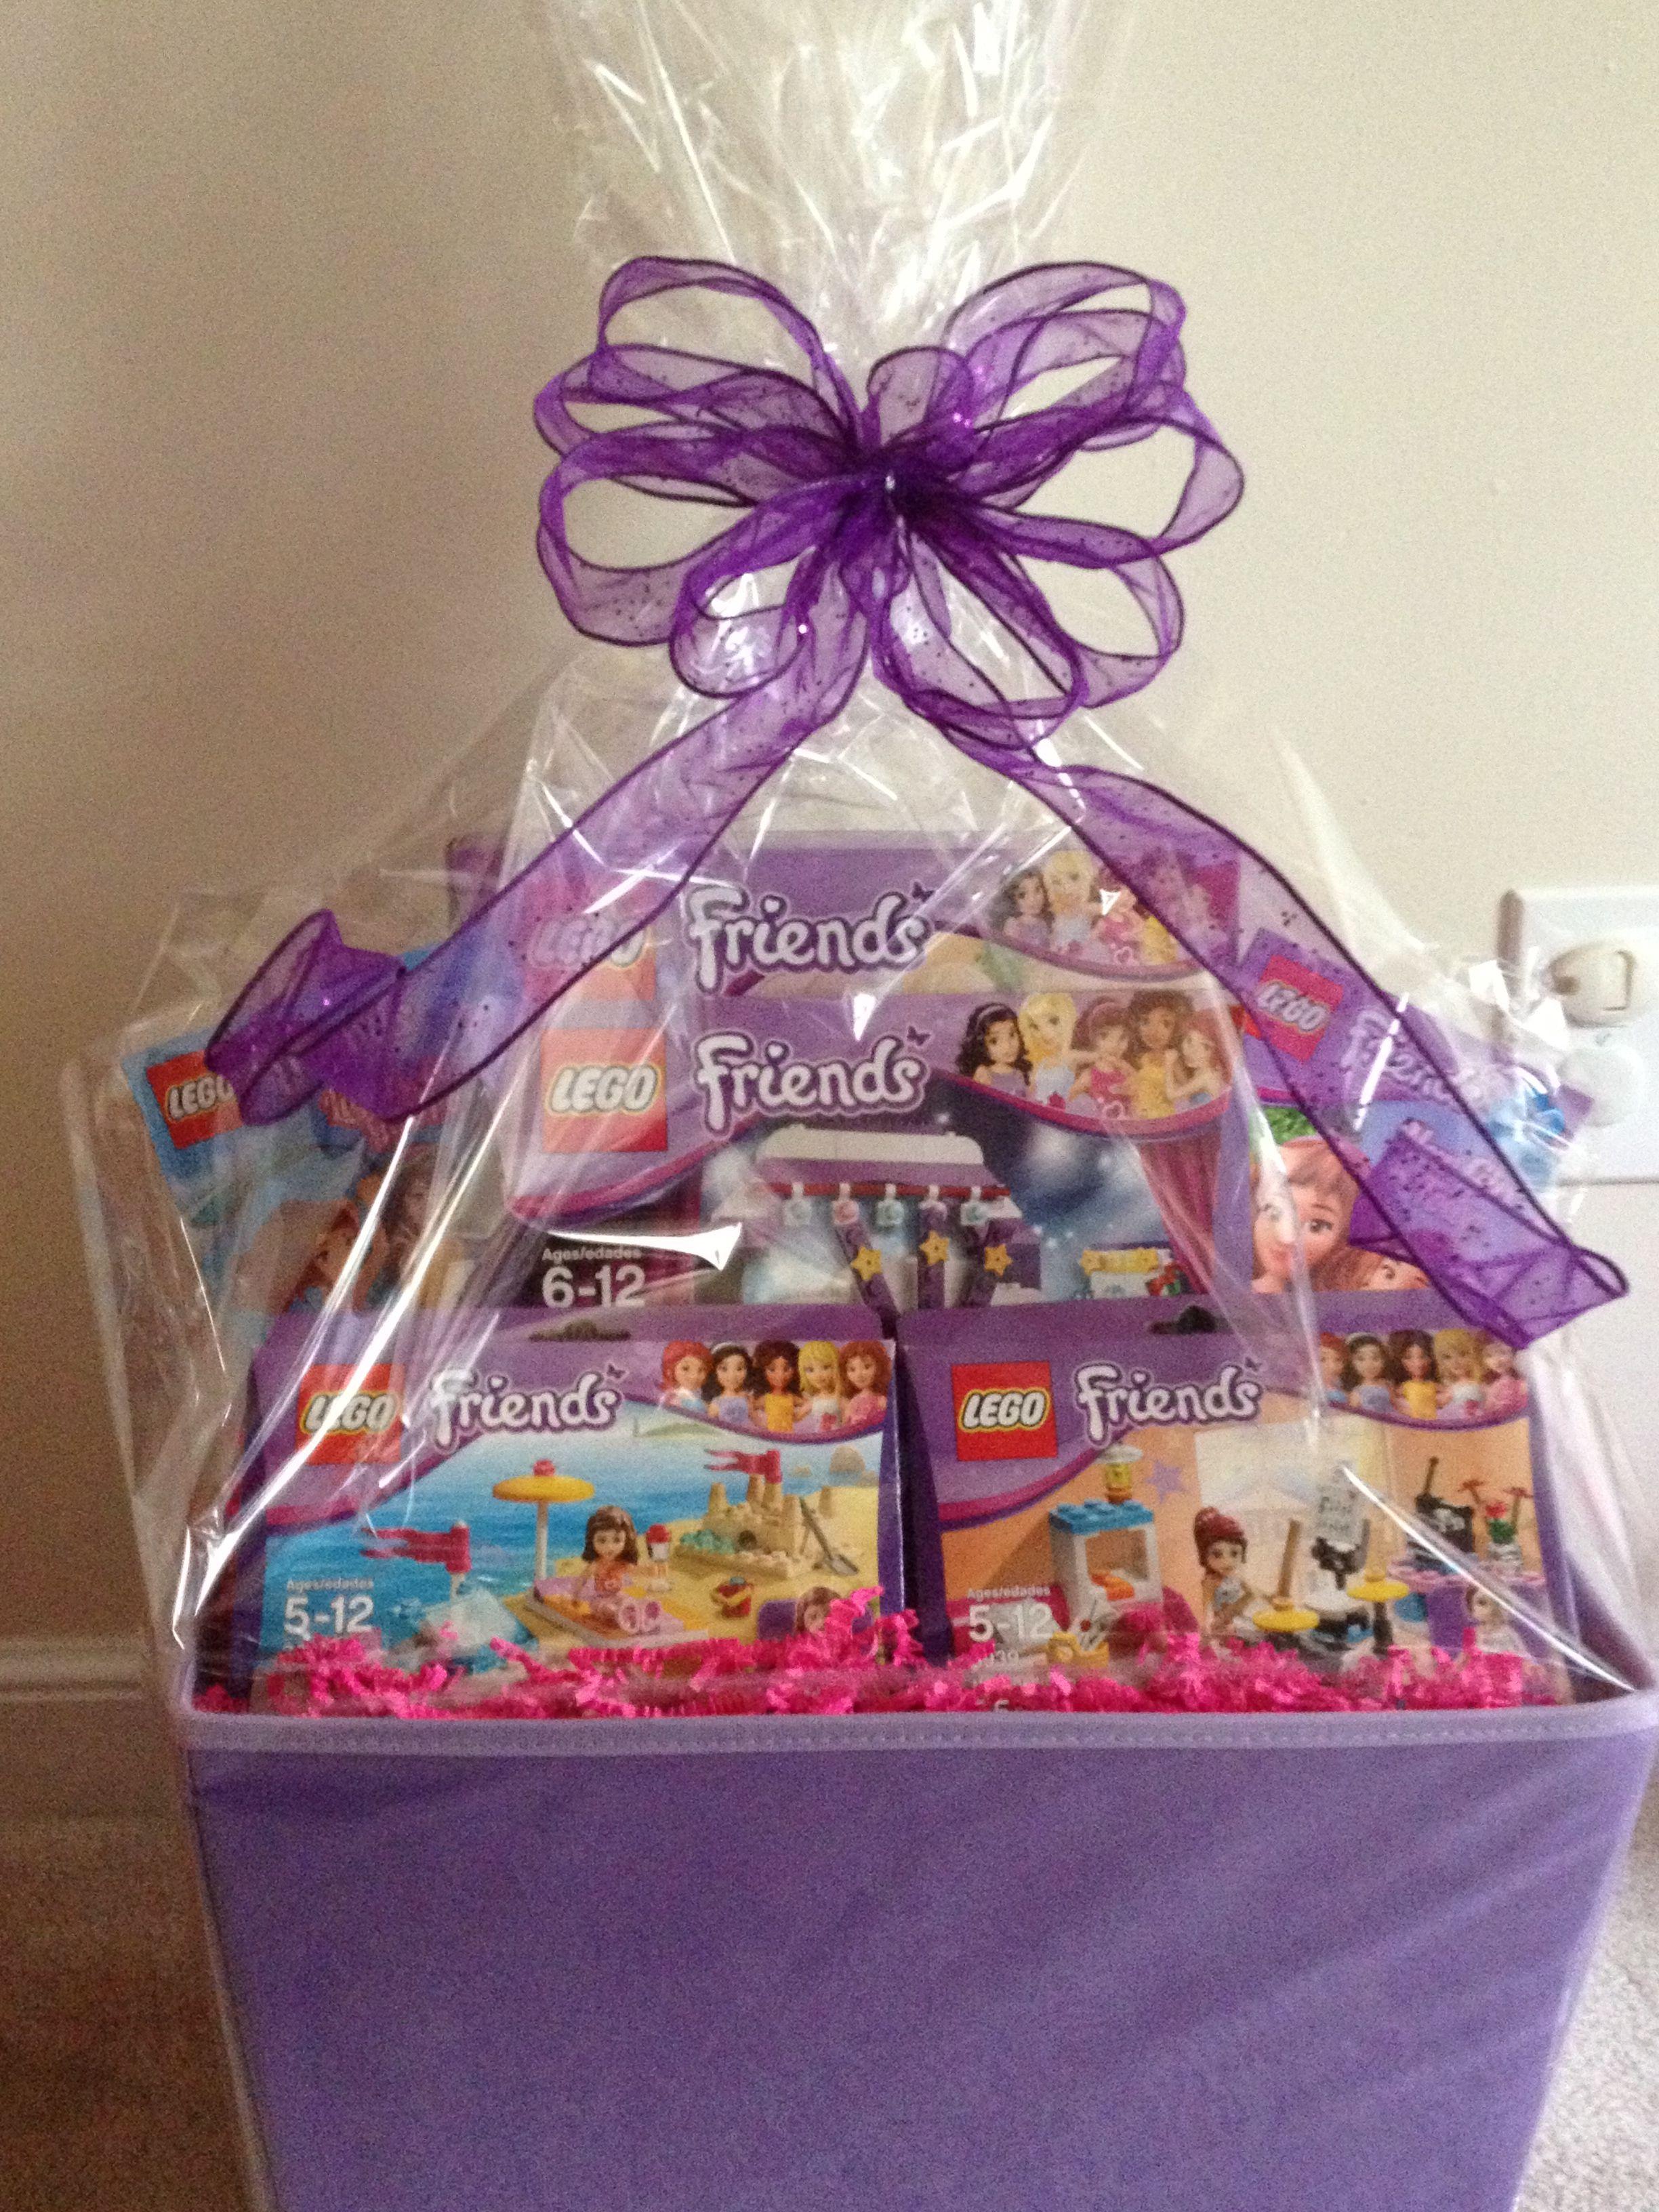 Lego friends gift basket gift basket for raffles pinterest lego friends gift basket fundraiser negle Gallery